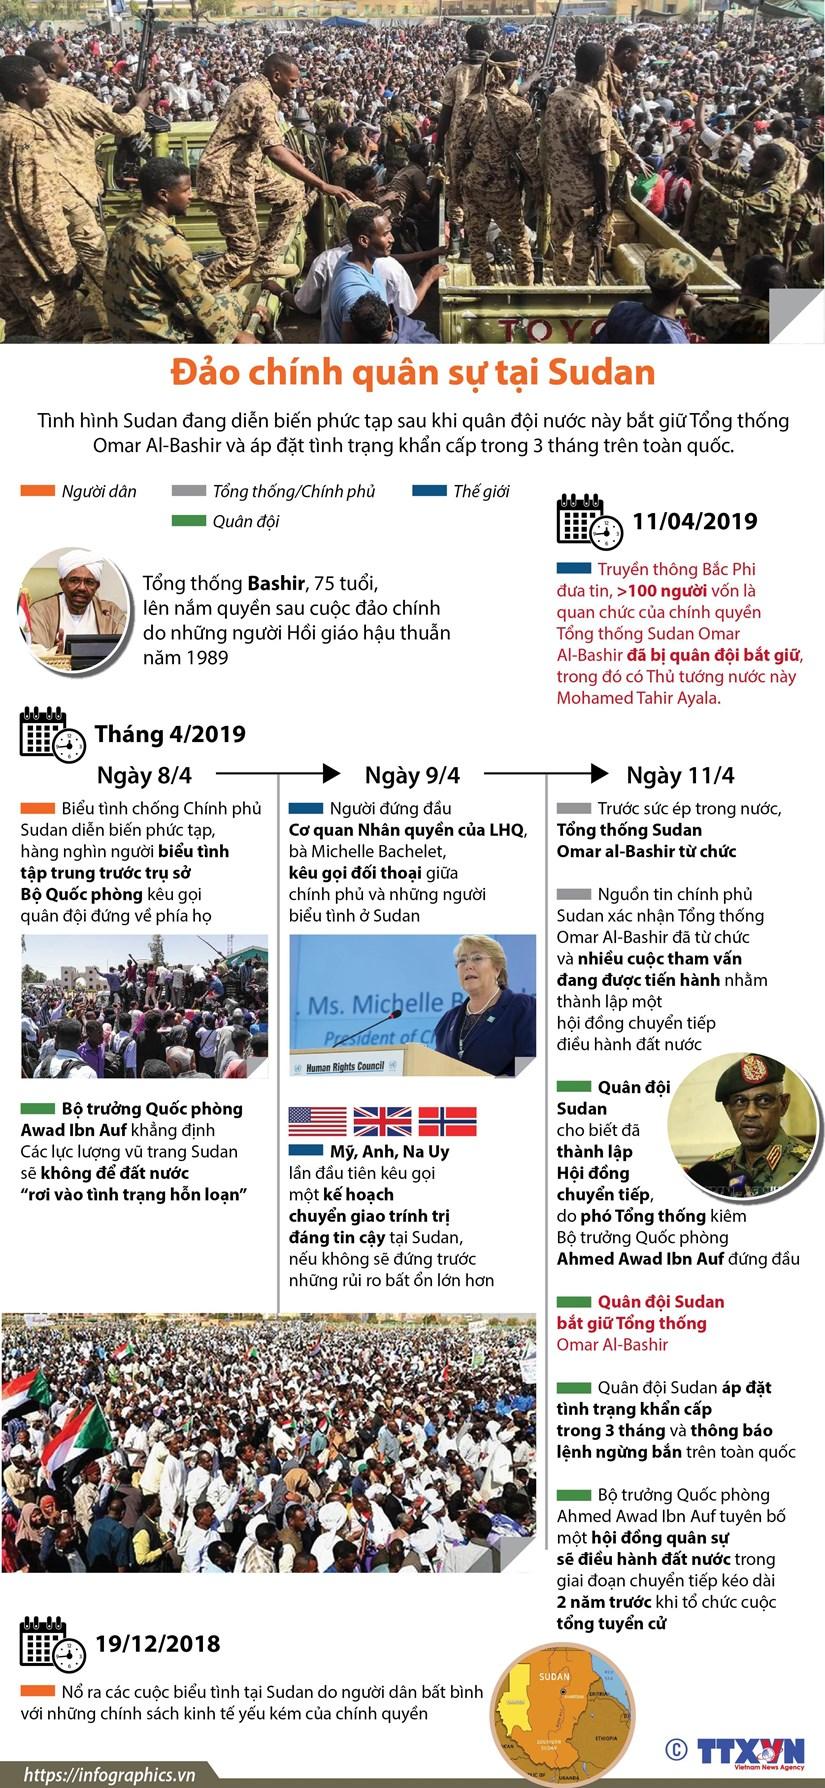 [Infographics] Dao chinh quan su tai Sudan, Tong thong bi bat giu hinh anh 1